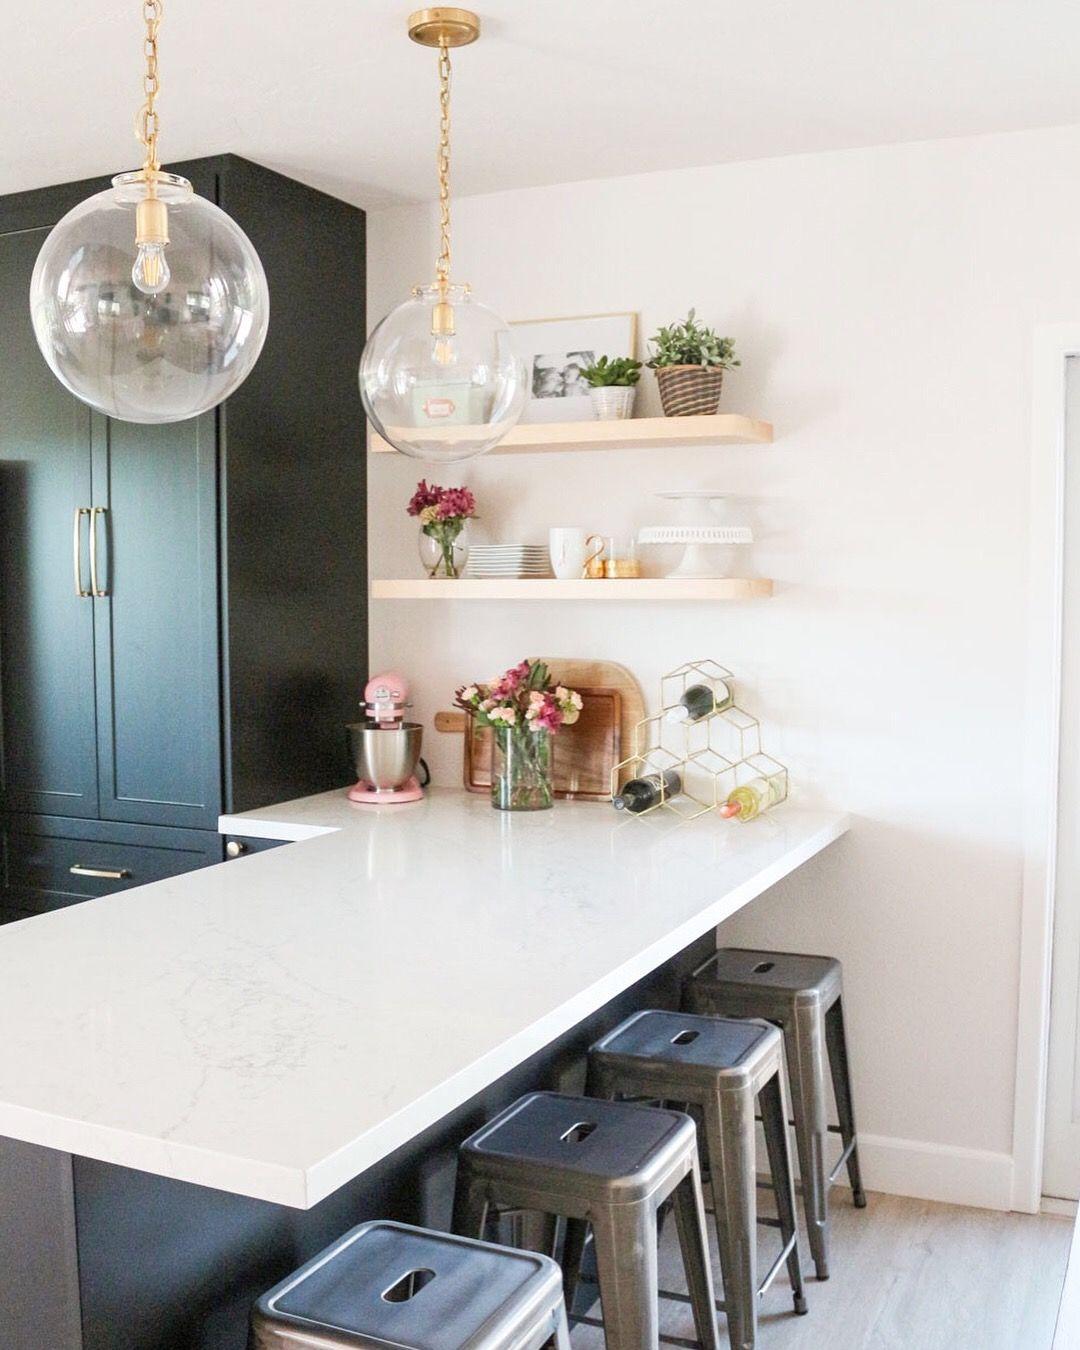 33 Modern Style Cozy Wooden Kitchen Design Ideas: Modern Cozy California Ranch: Renovation Progress